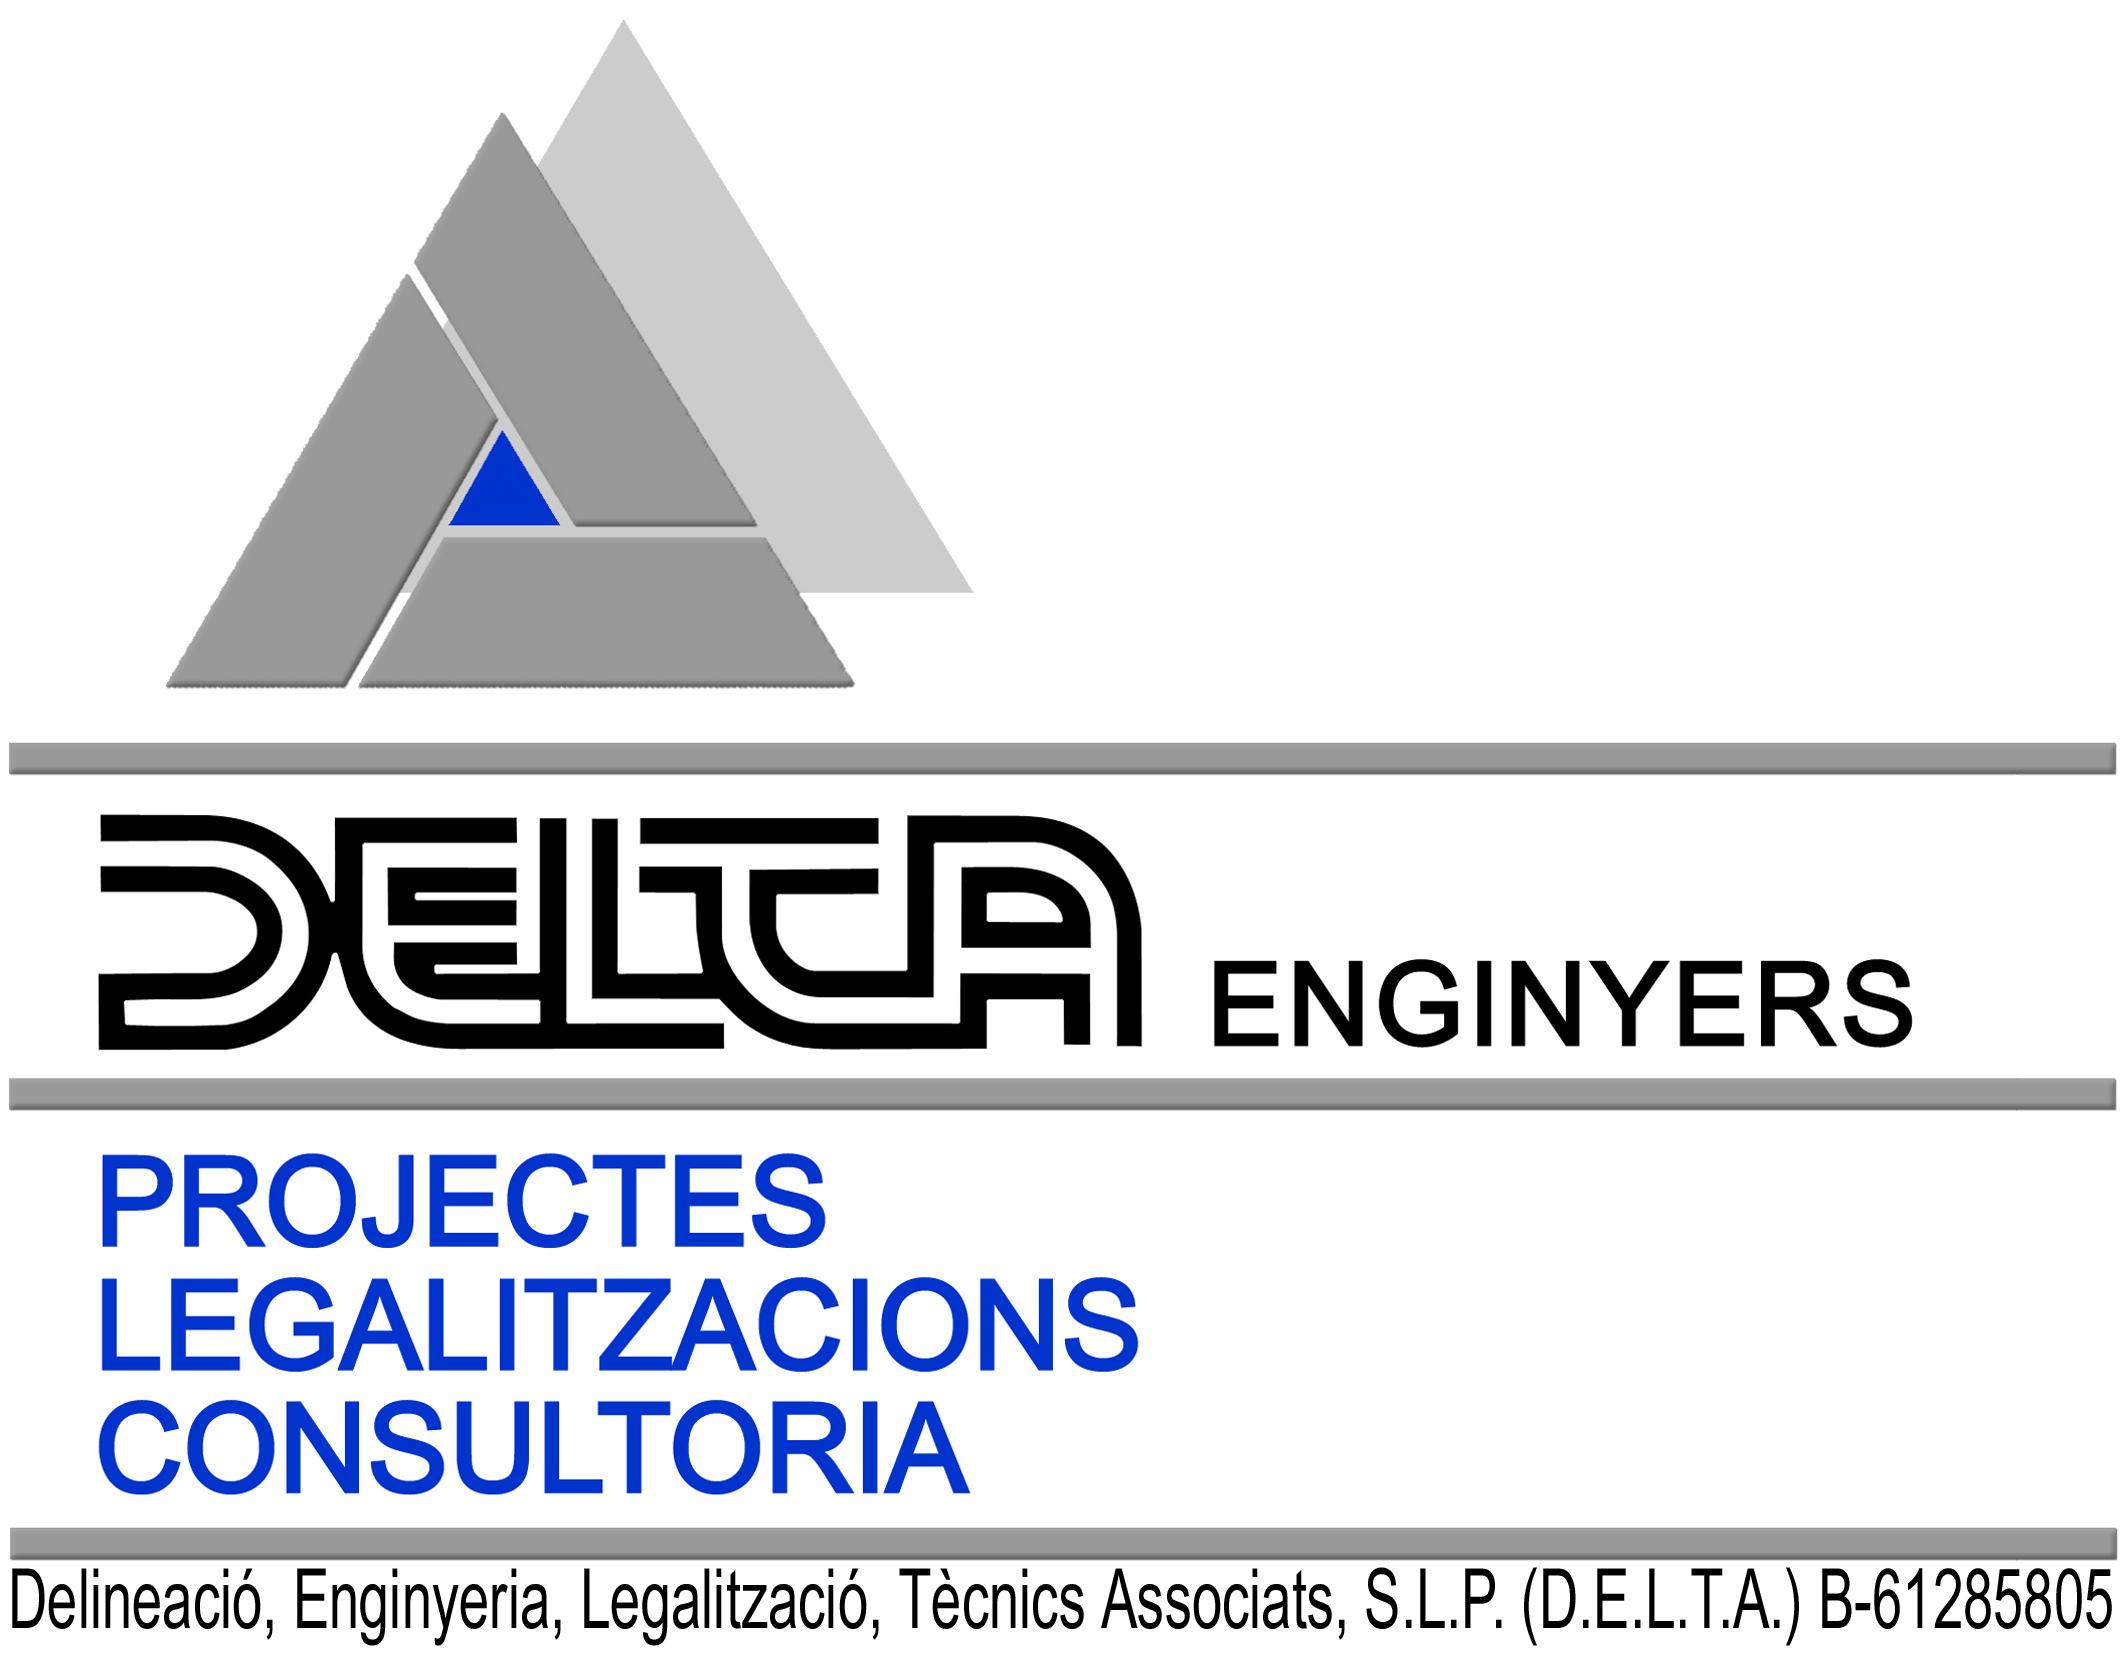 Delta Enginyers